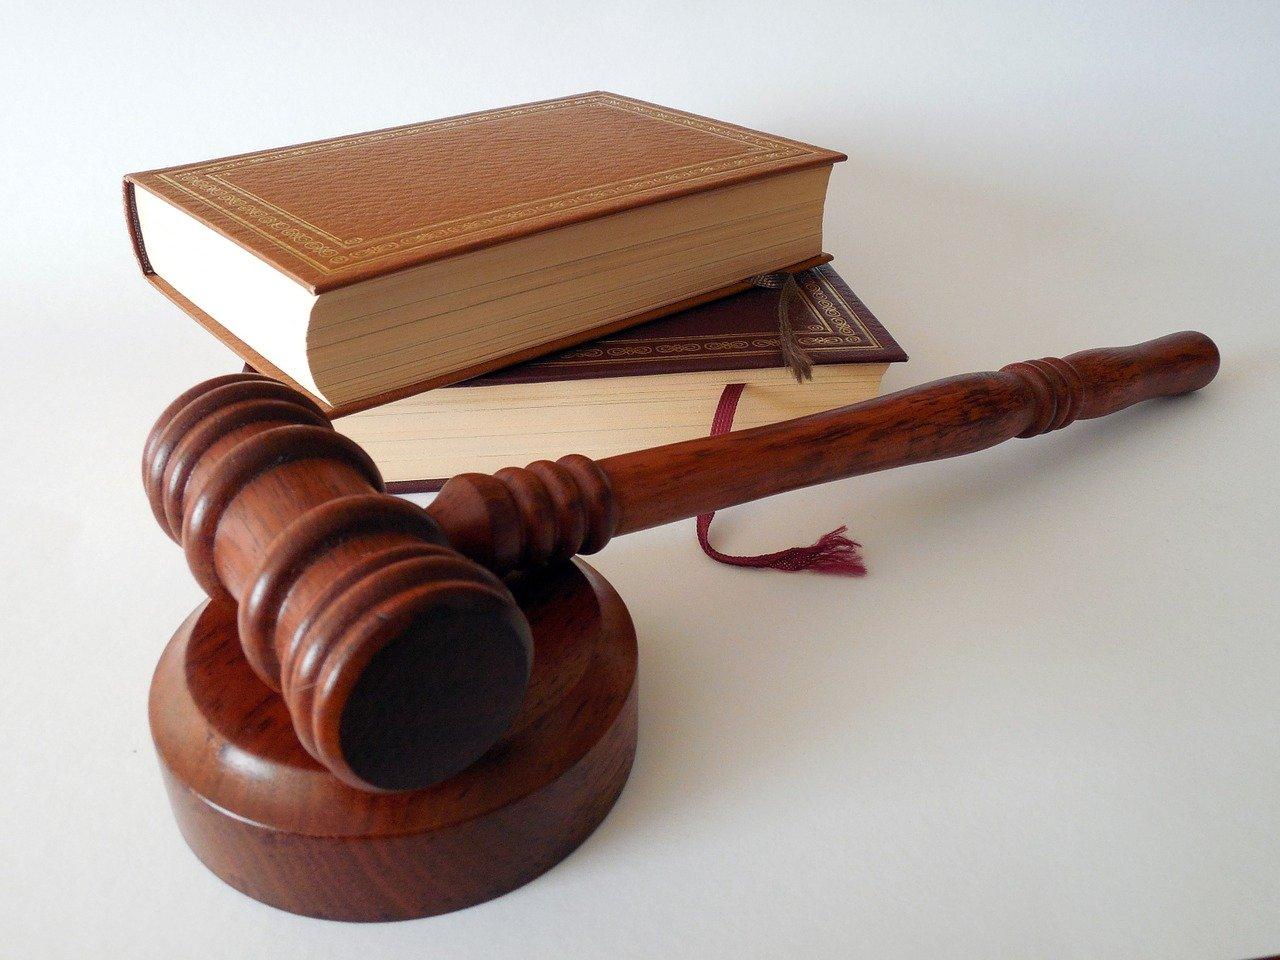 Symbolbild Gericht, Urteil, Justiz | succo bei pixabay.com